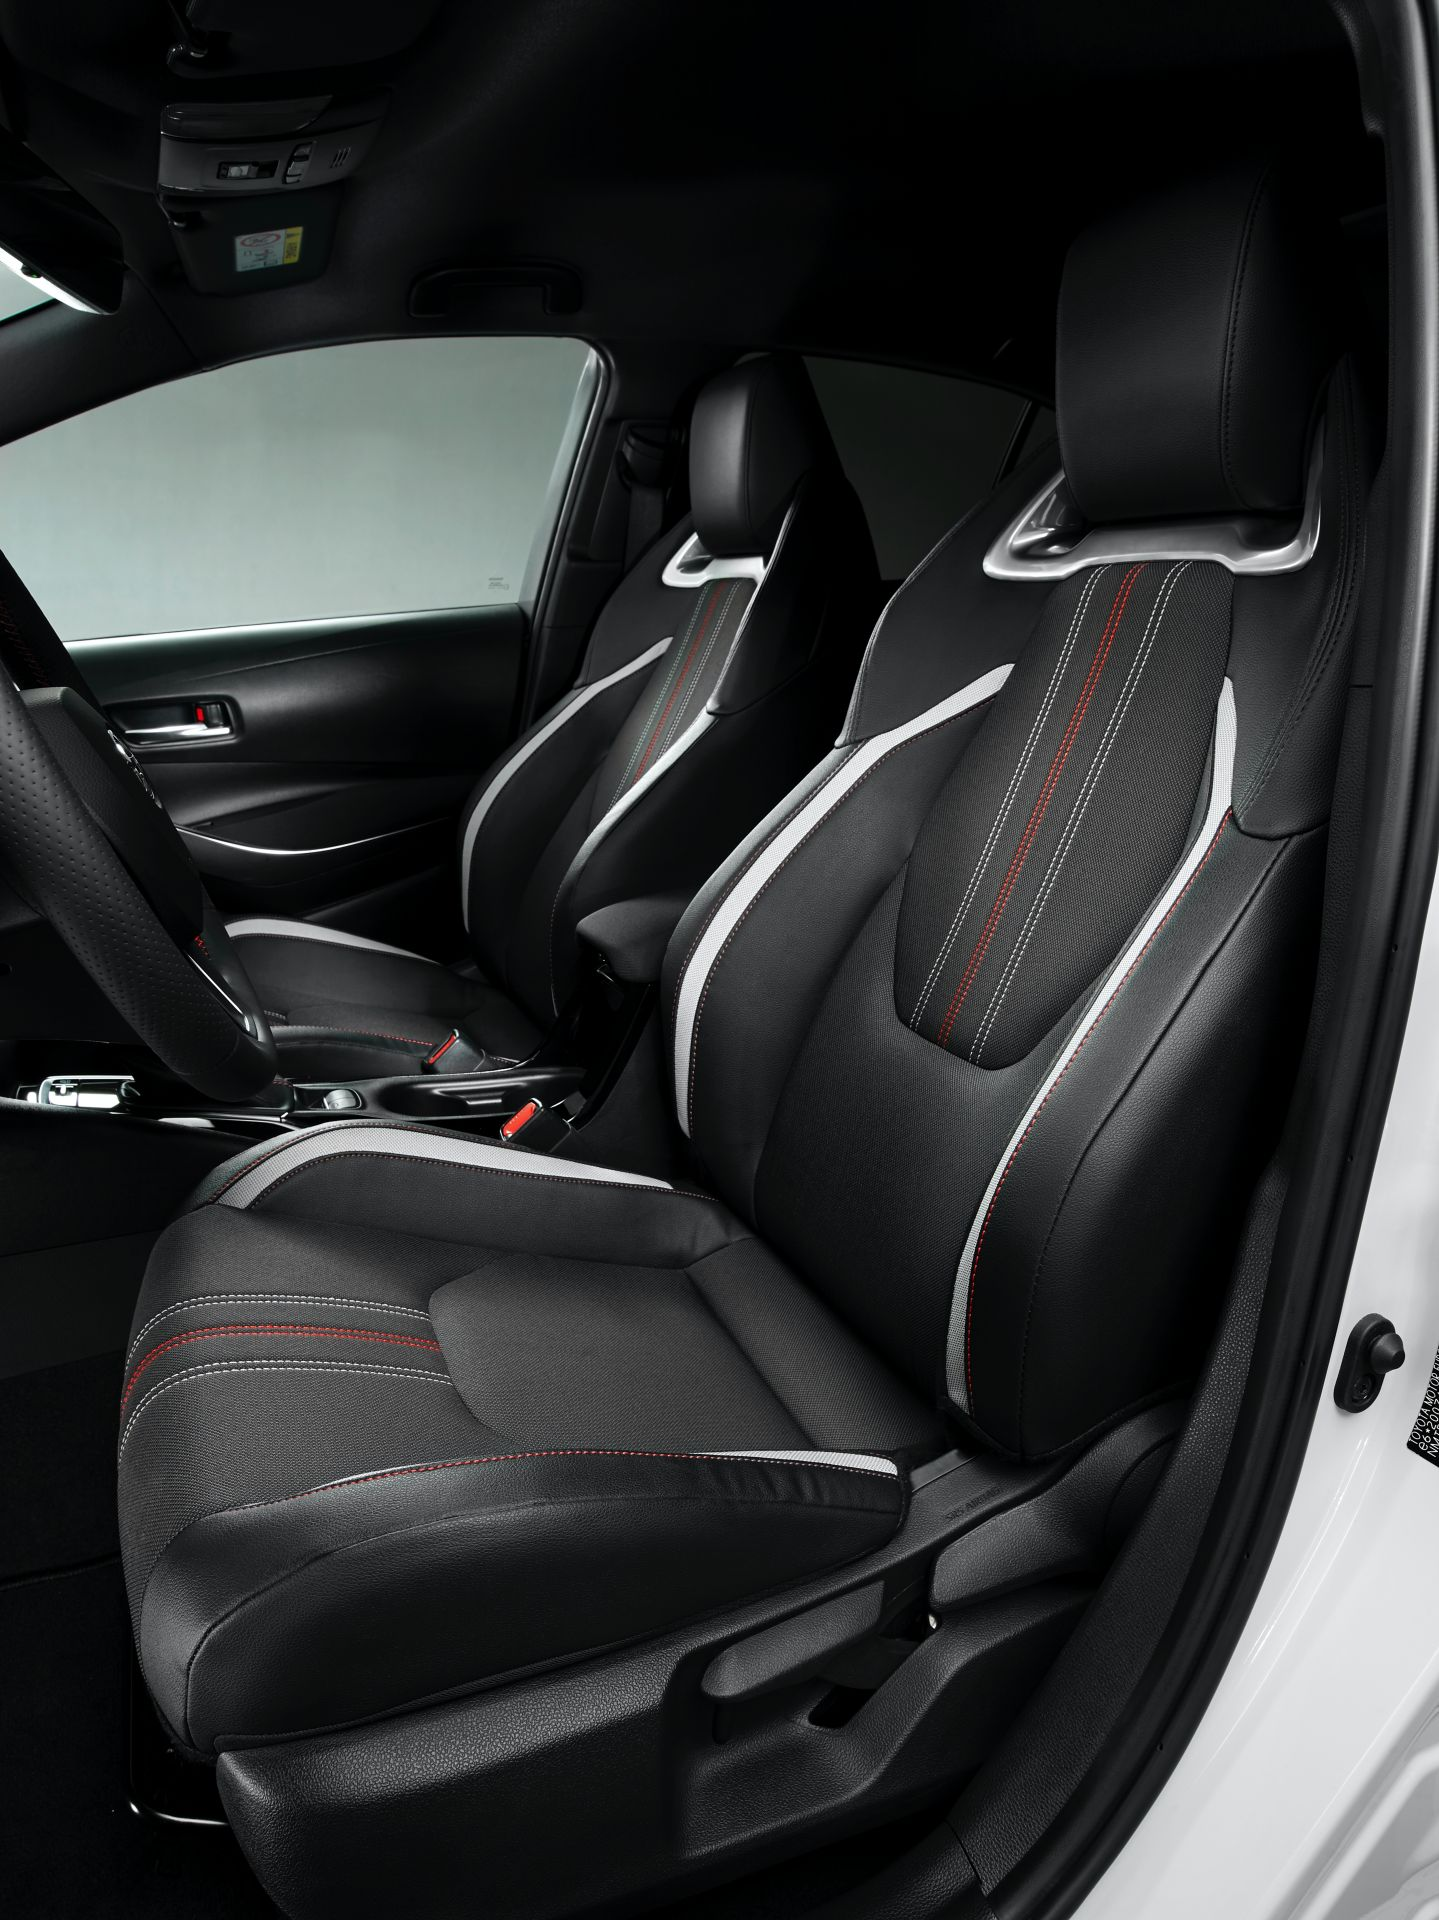 2021 Toyota Corolla Sedan GR Sport European spec 4